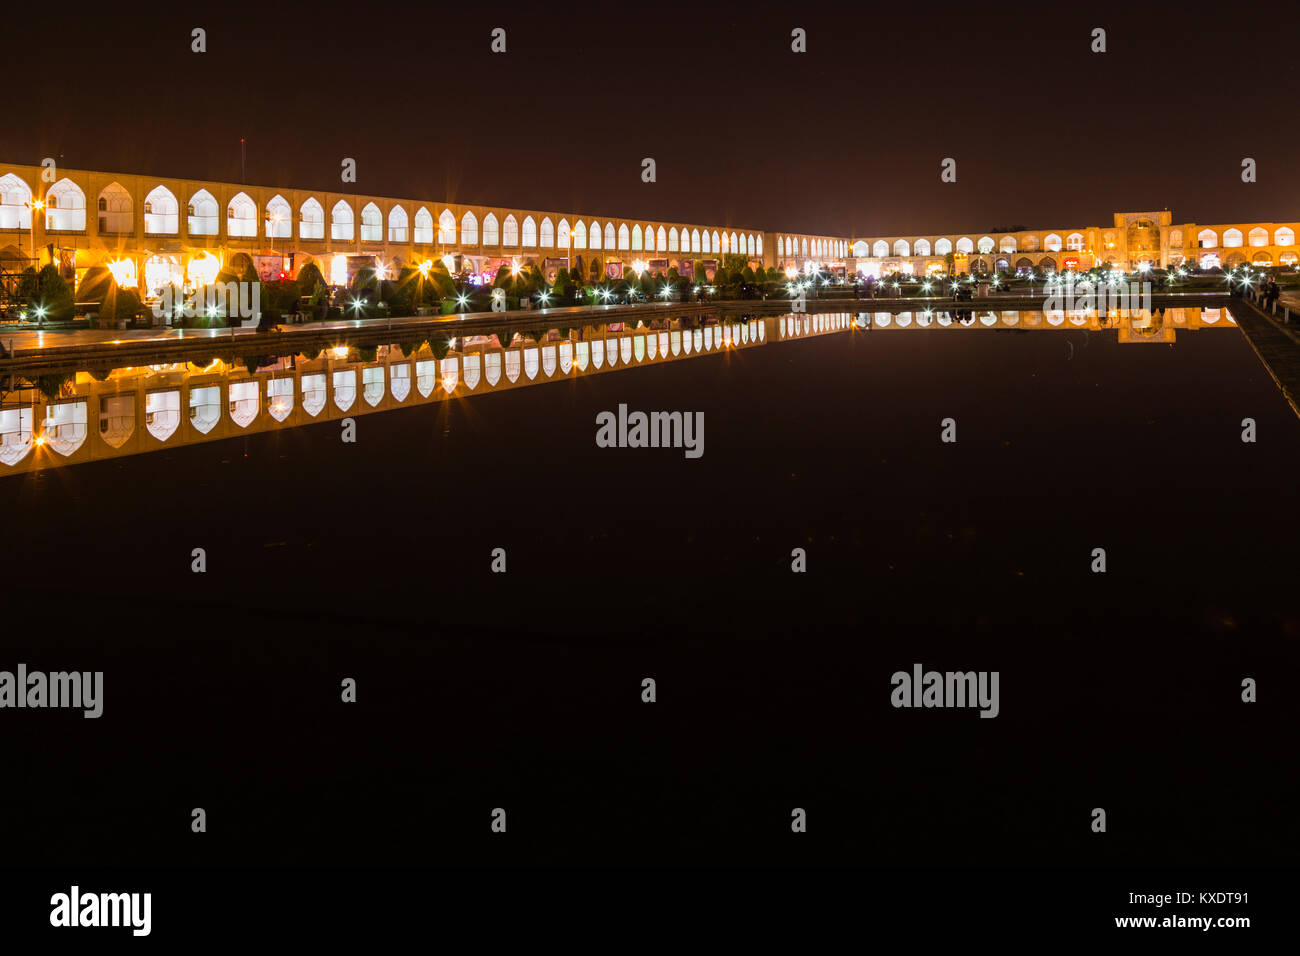 Naqsh-e Jahan or Imam Square, Esfahan, Iran - Stock Image